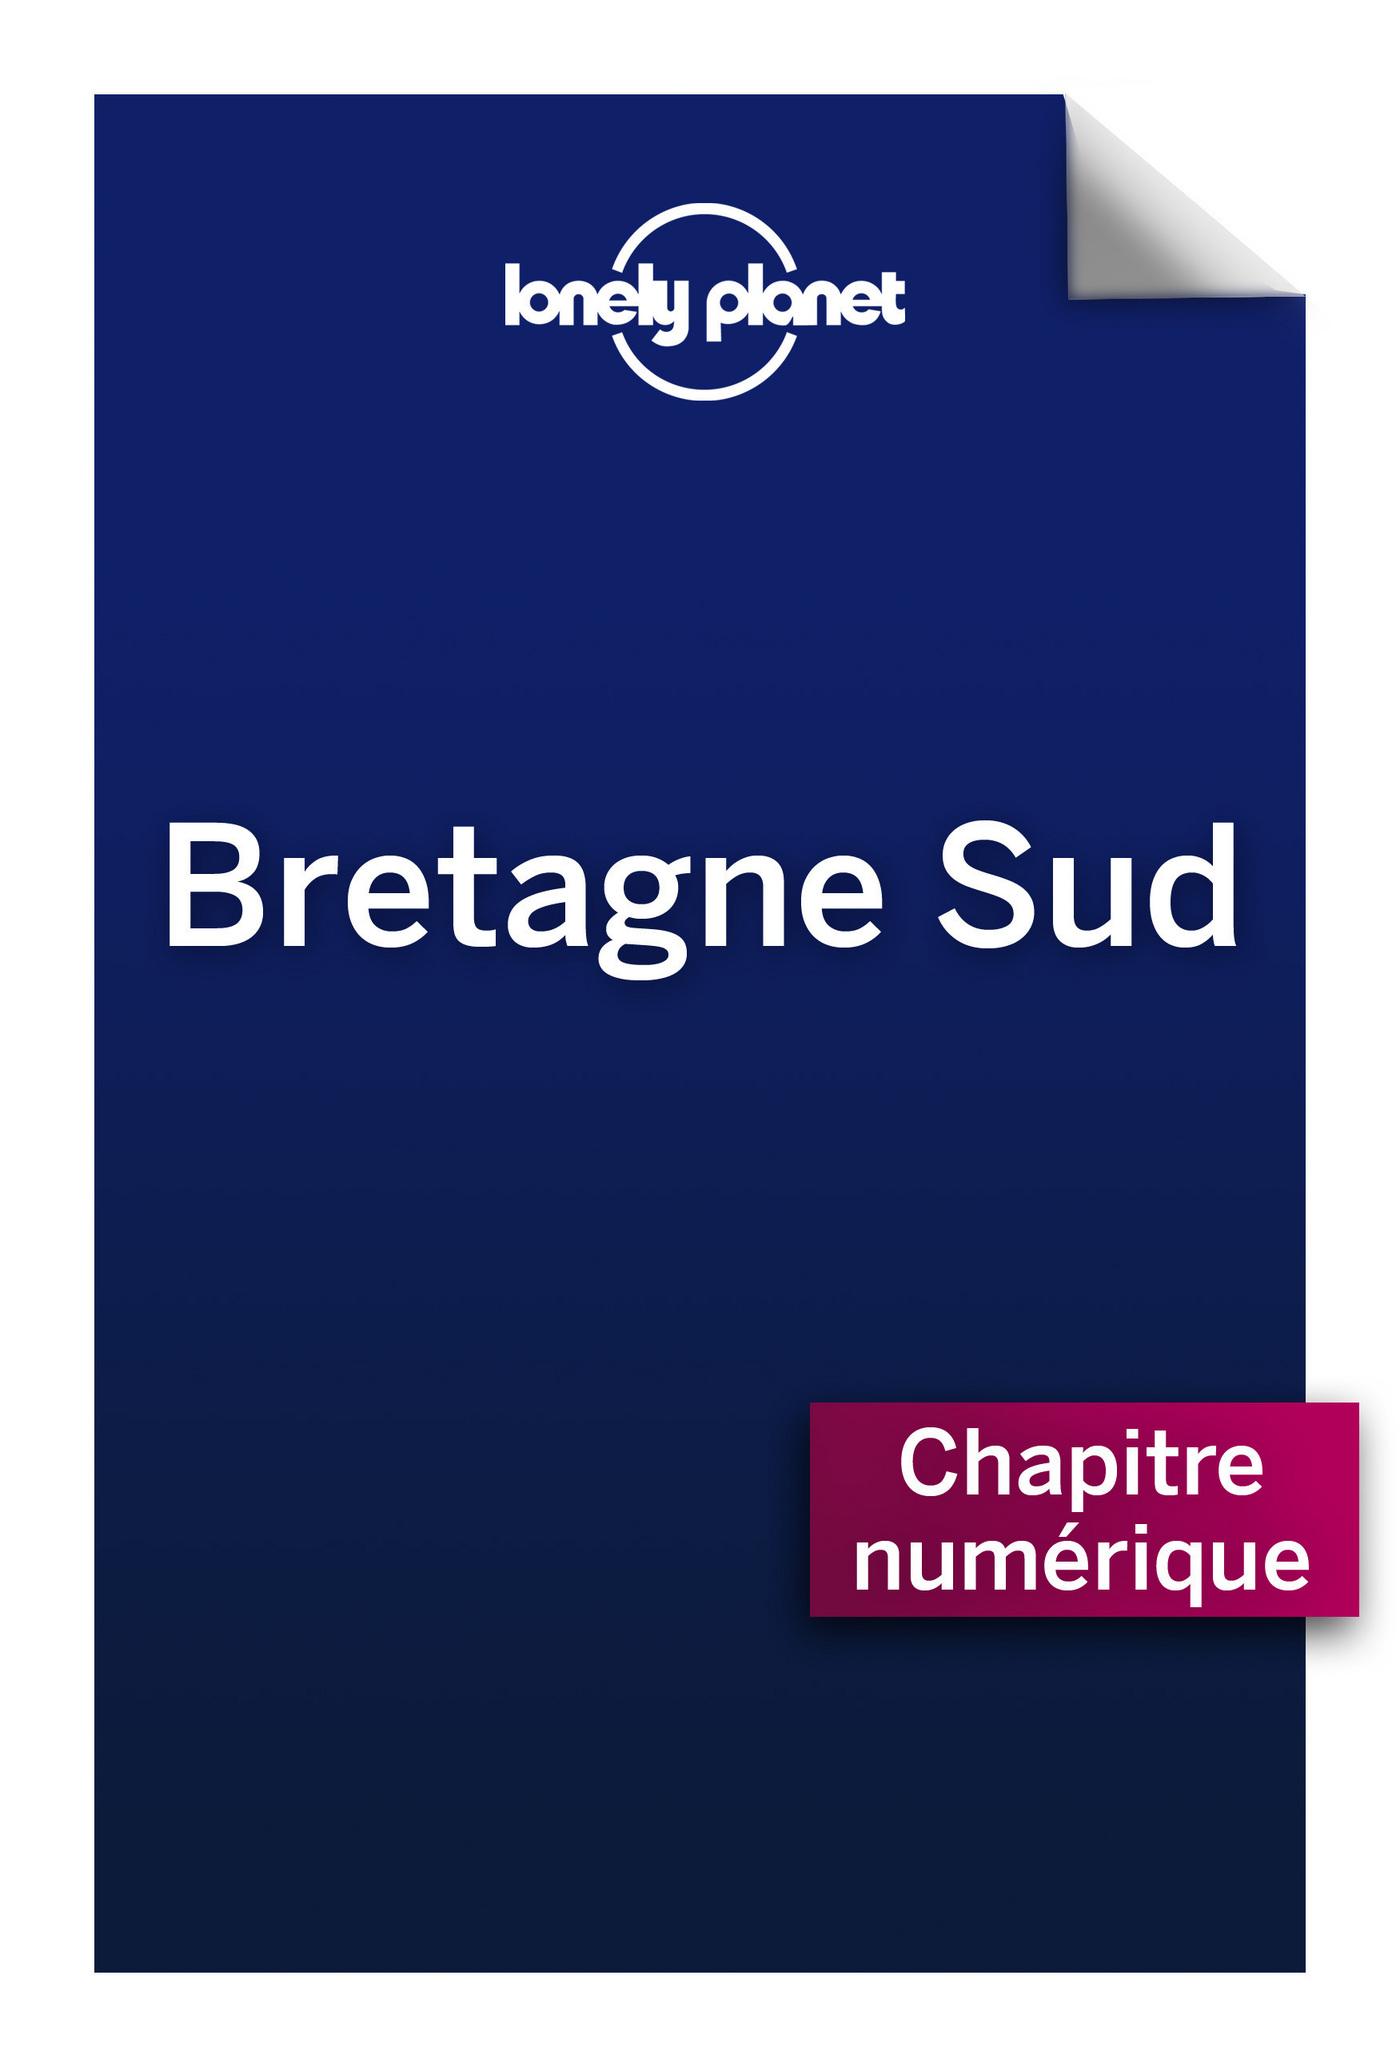 Bretagne Sud 2 - Comprendre la Bretagne Sud et Bretagne Sud pratique